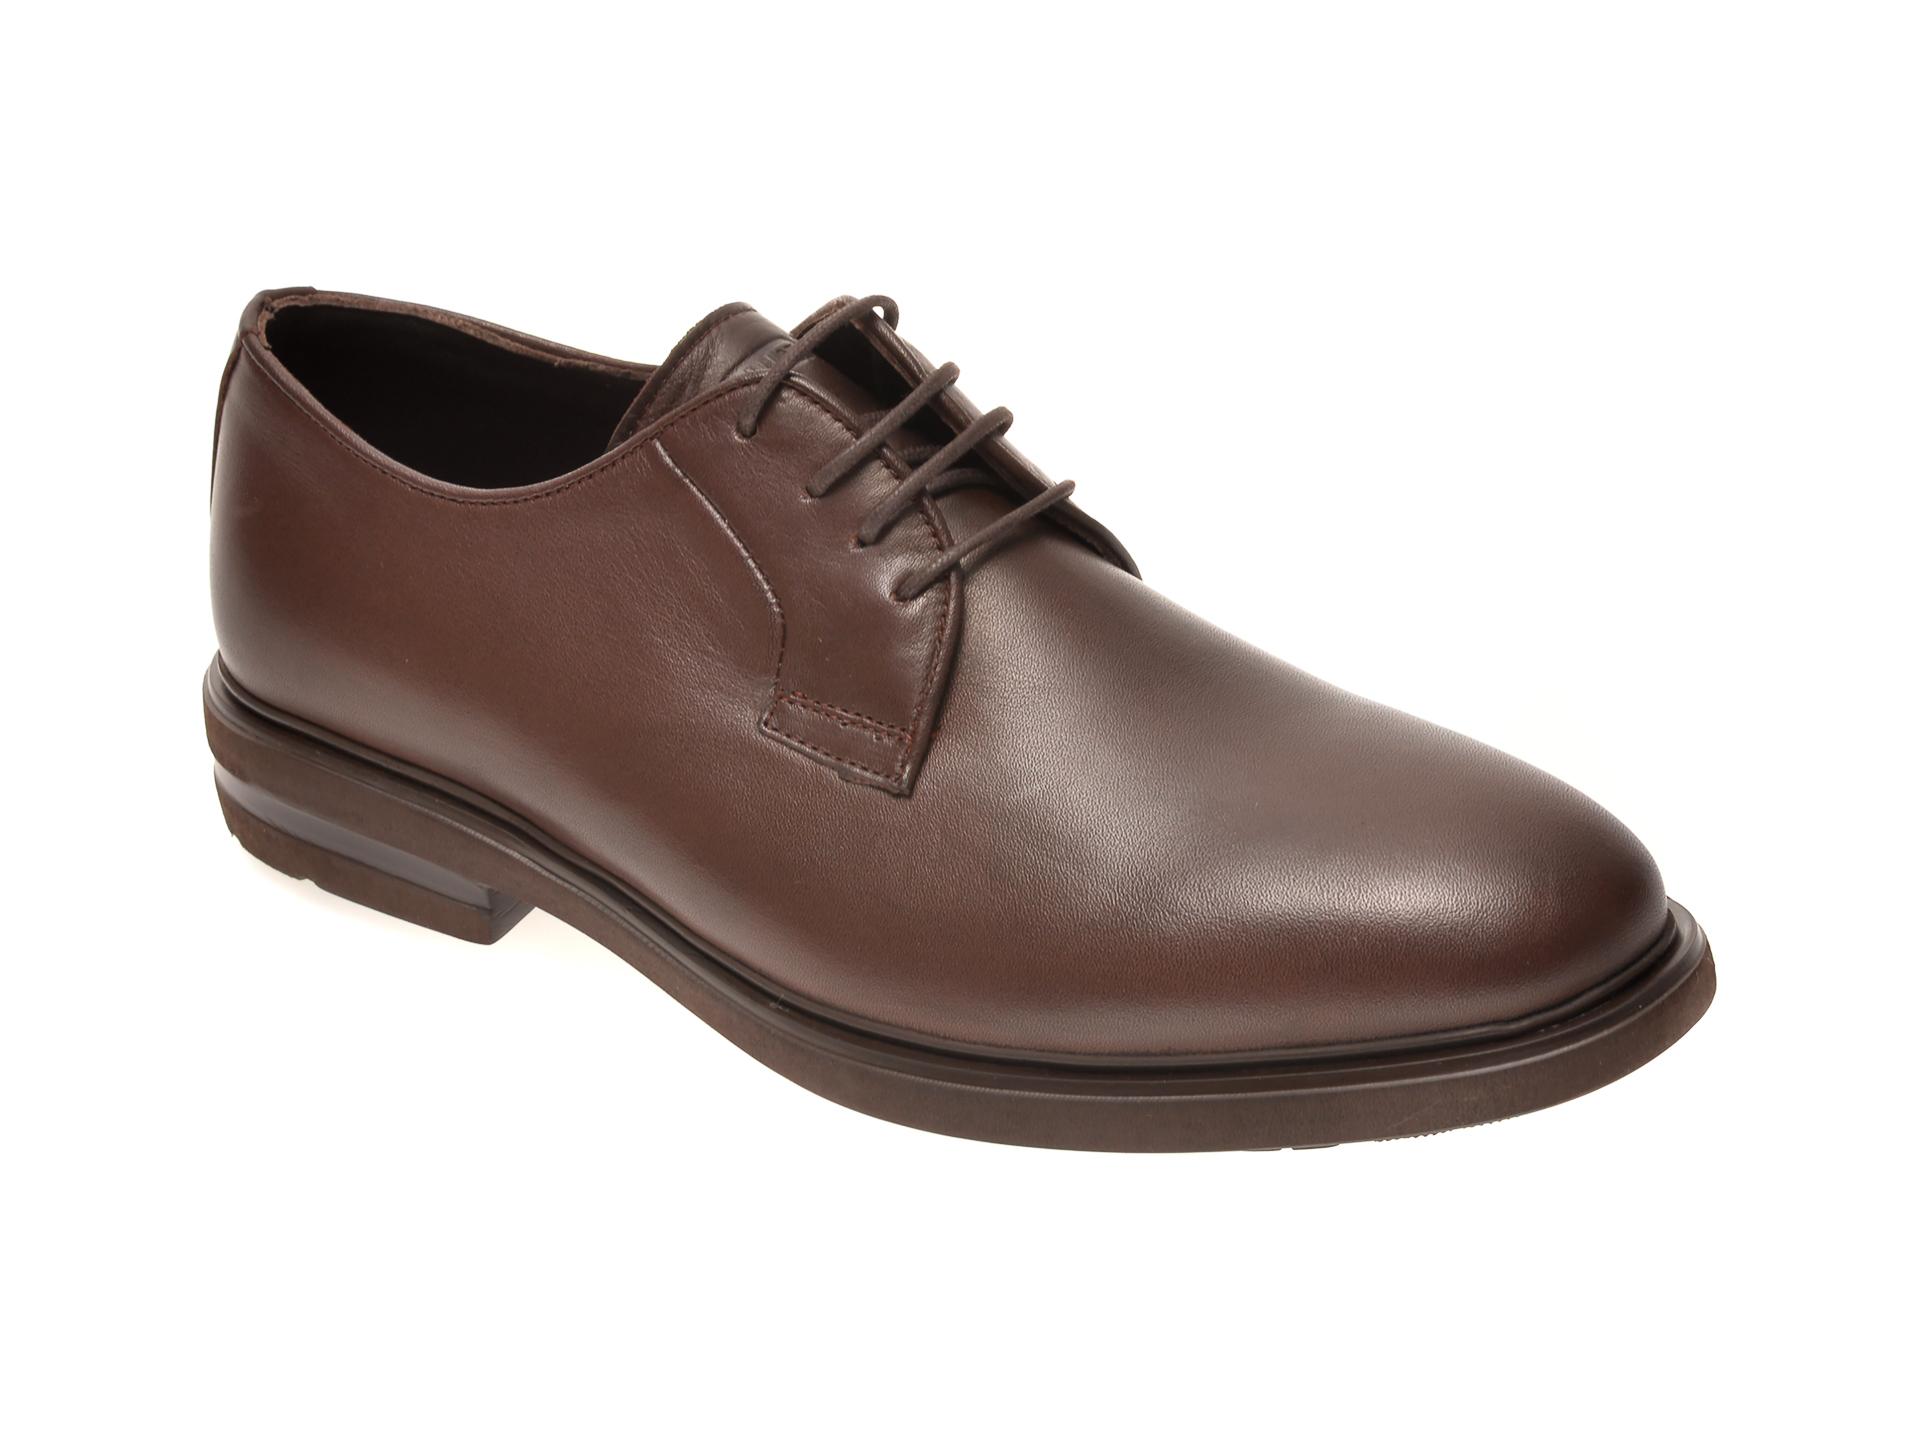 Pantofi OTTER maro, E1801, din piele naturala New